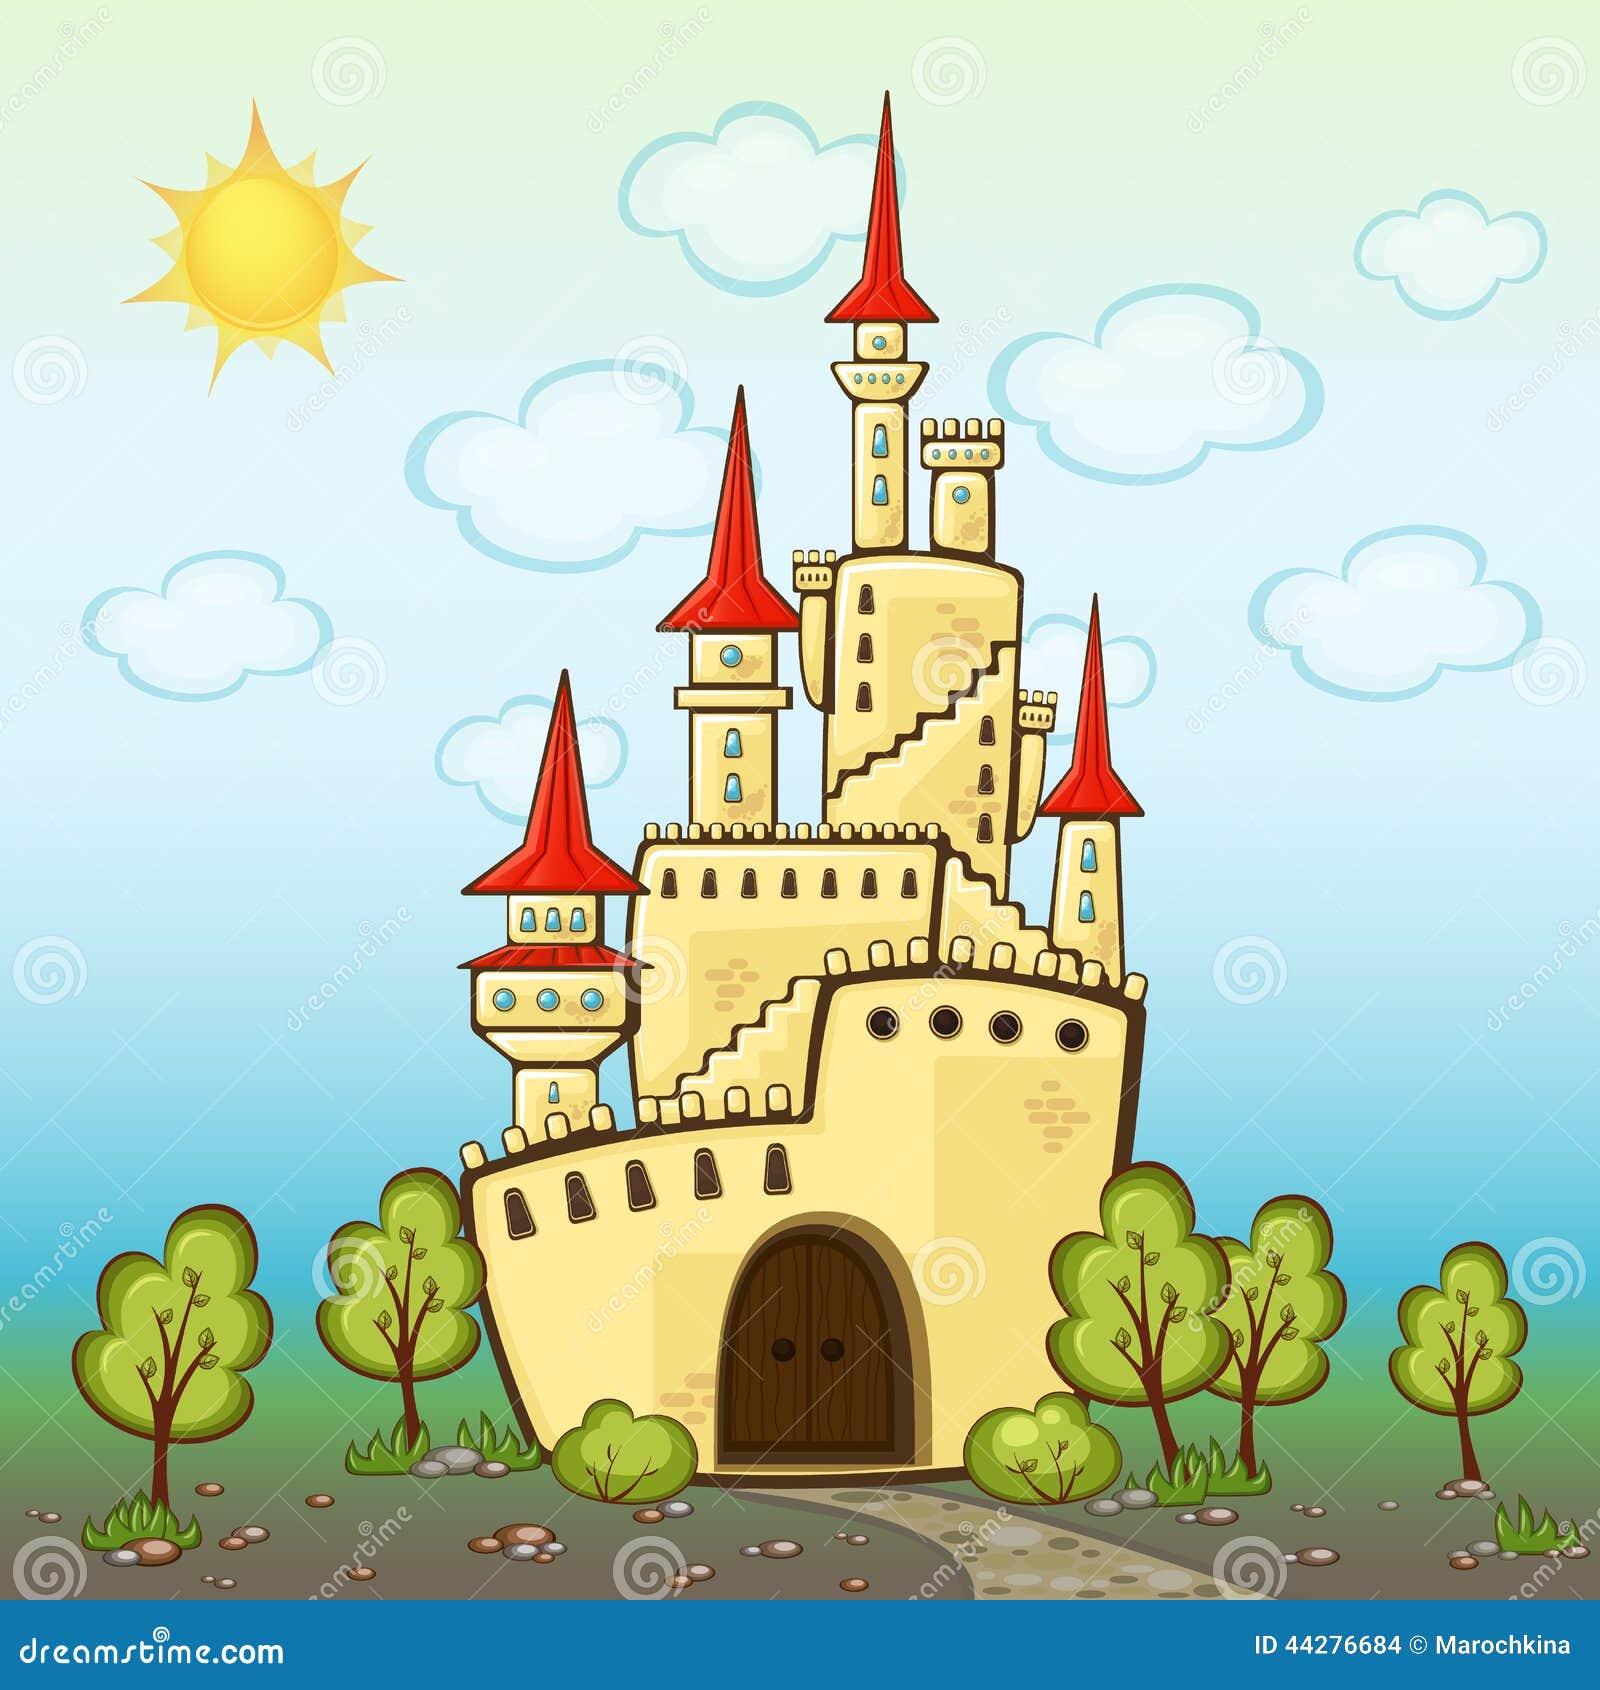 Castle In Cartoon Style Stock Vector. Illustration Of